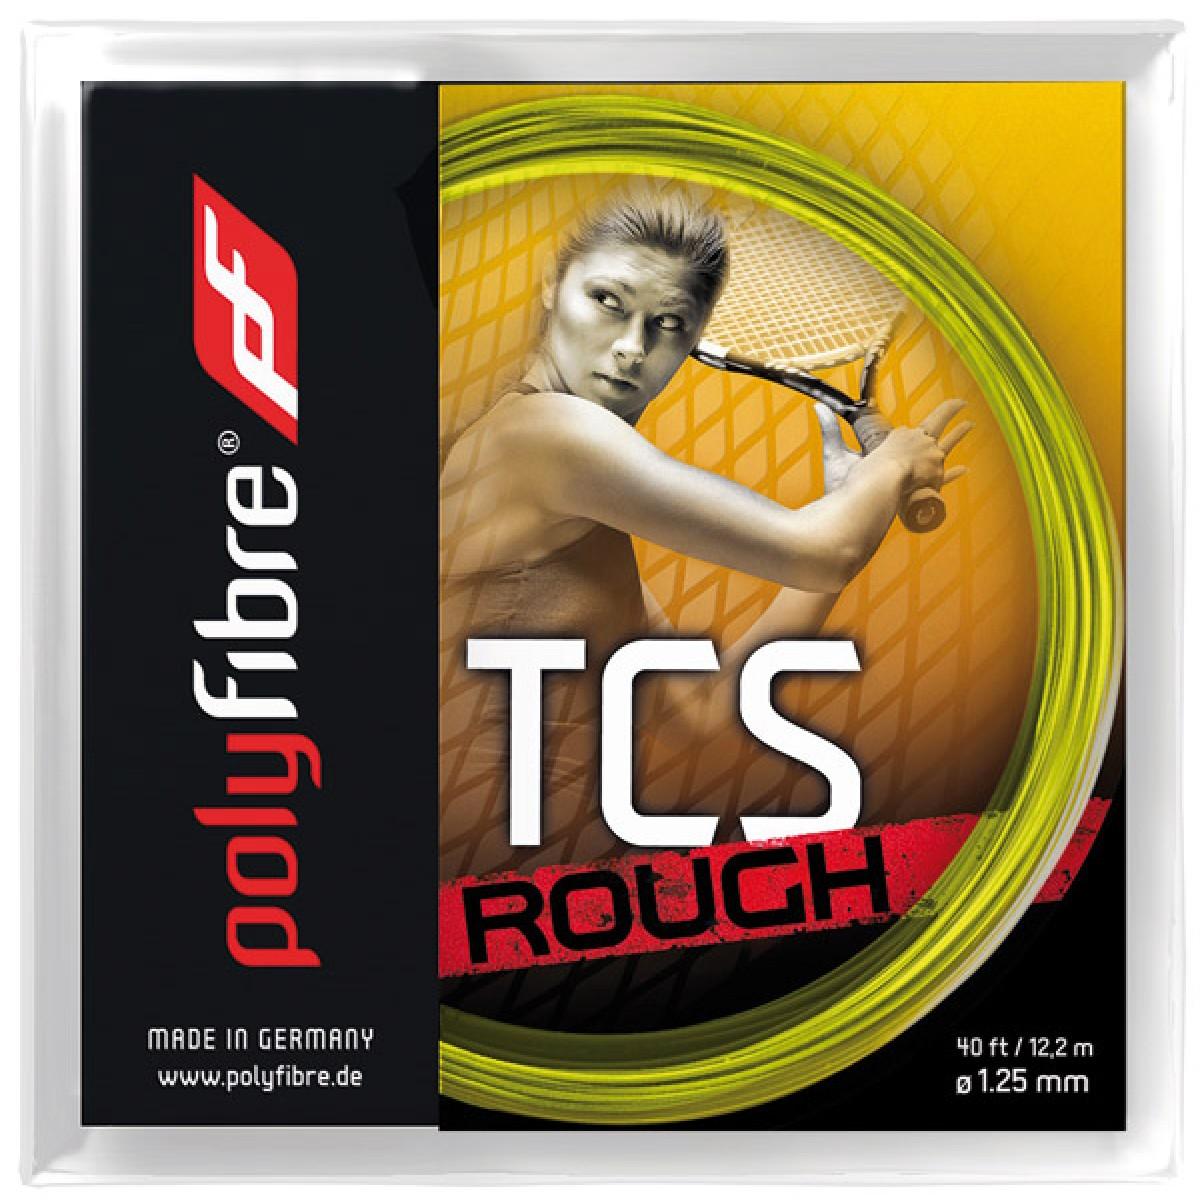 CORDAGE POLYFIBRE TCS ROUGH (12,2 METRES)